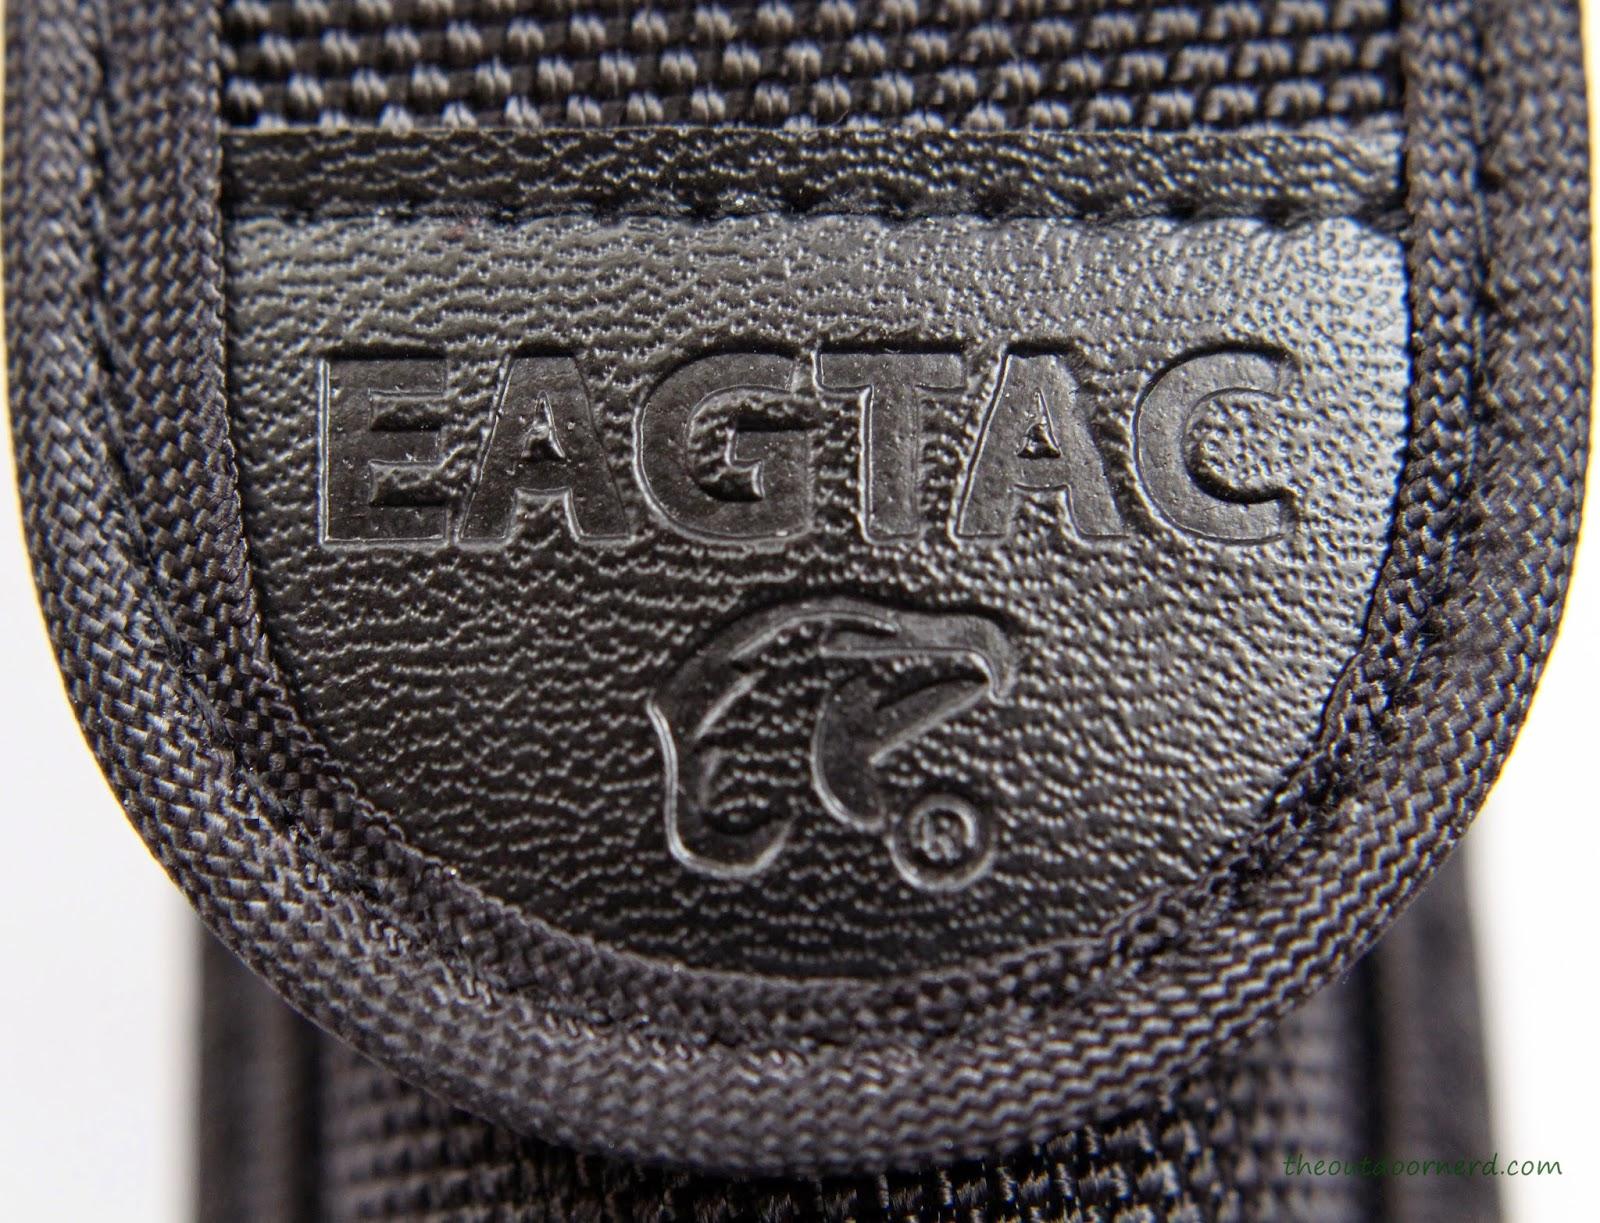 EagleTac D25LC2 Mini 18650 Flashlight Sheath 4